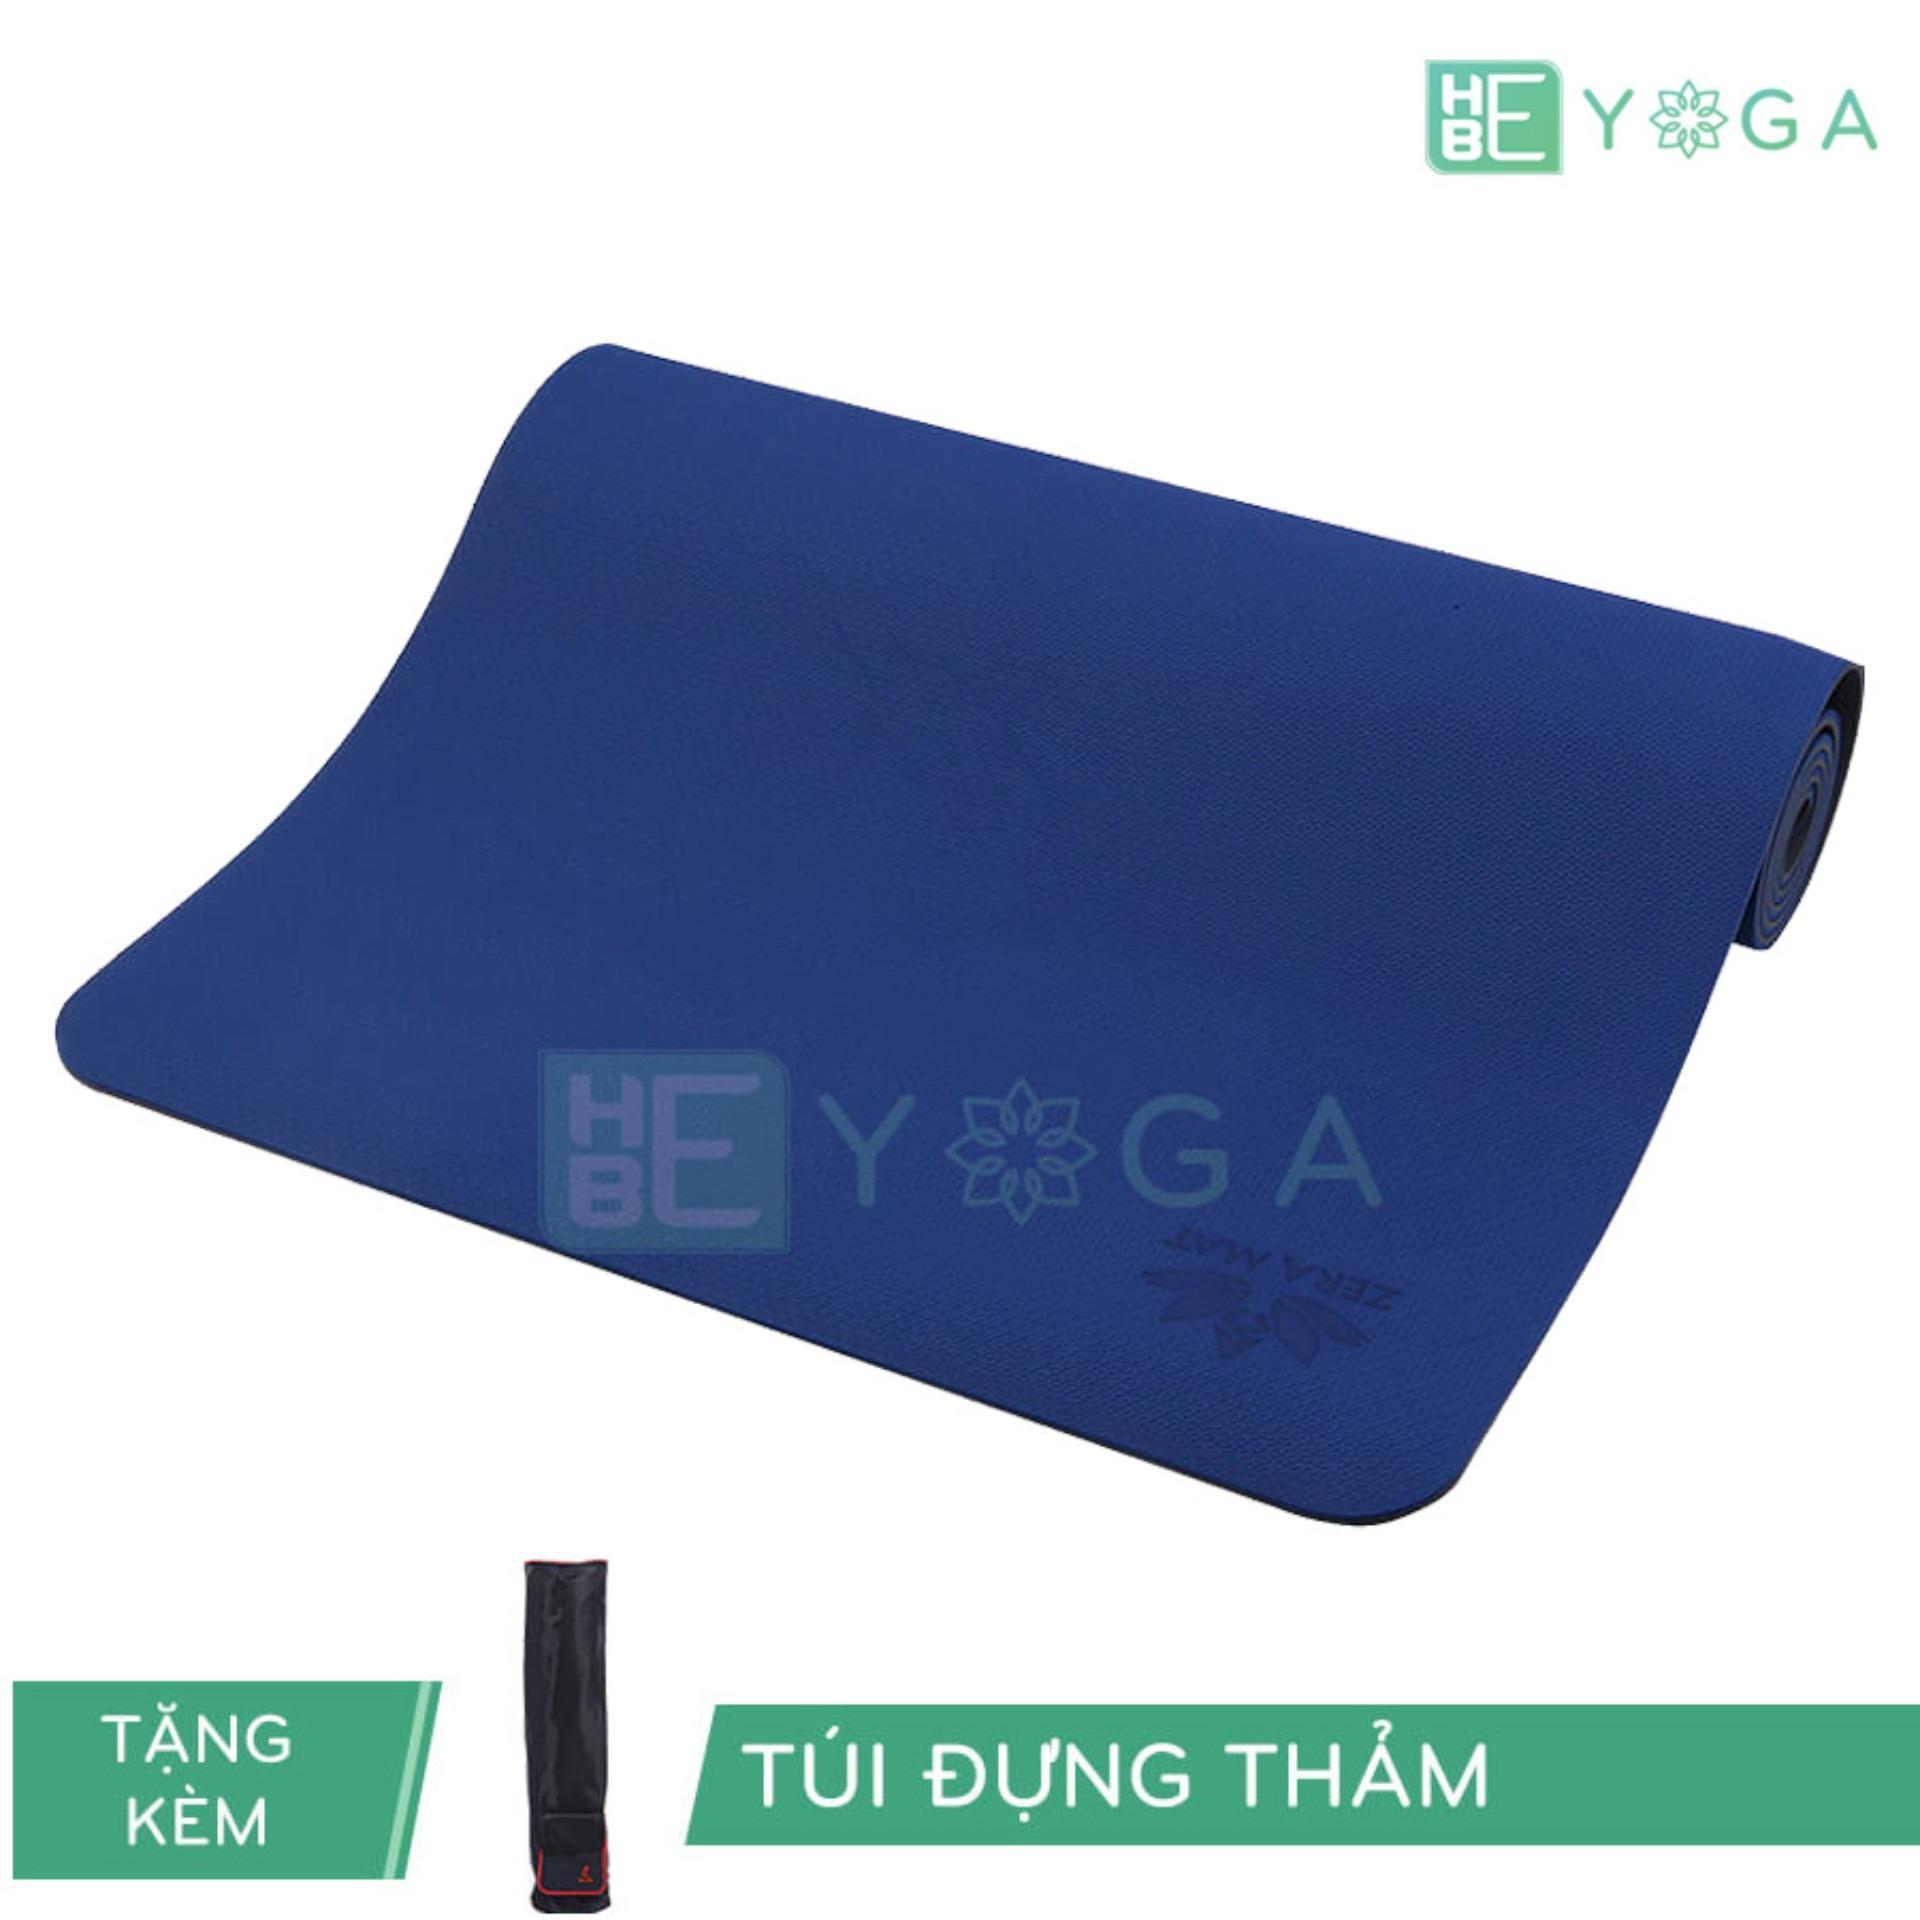 Mua Thảm Tập Yoga Zera Mats 8Mm 1 Lớp Kem Tui Đựng Rẻ